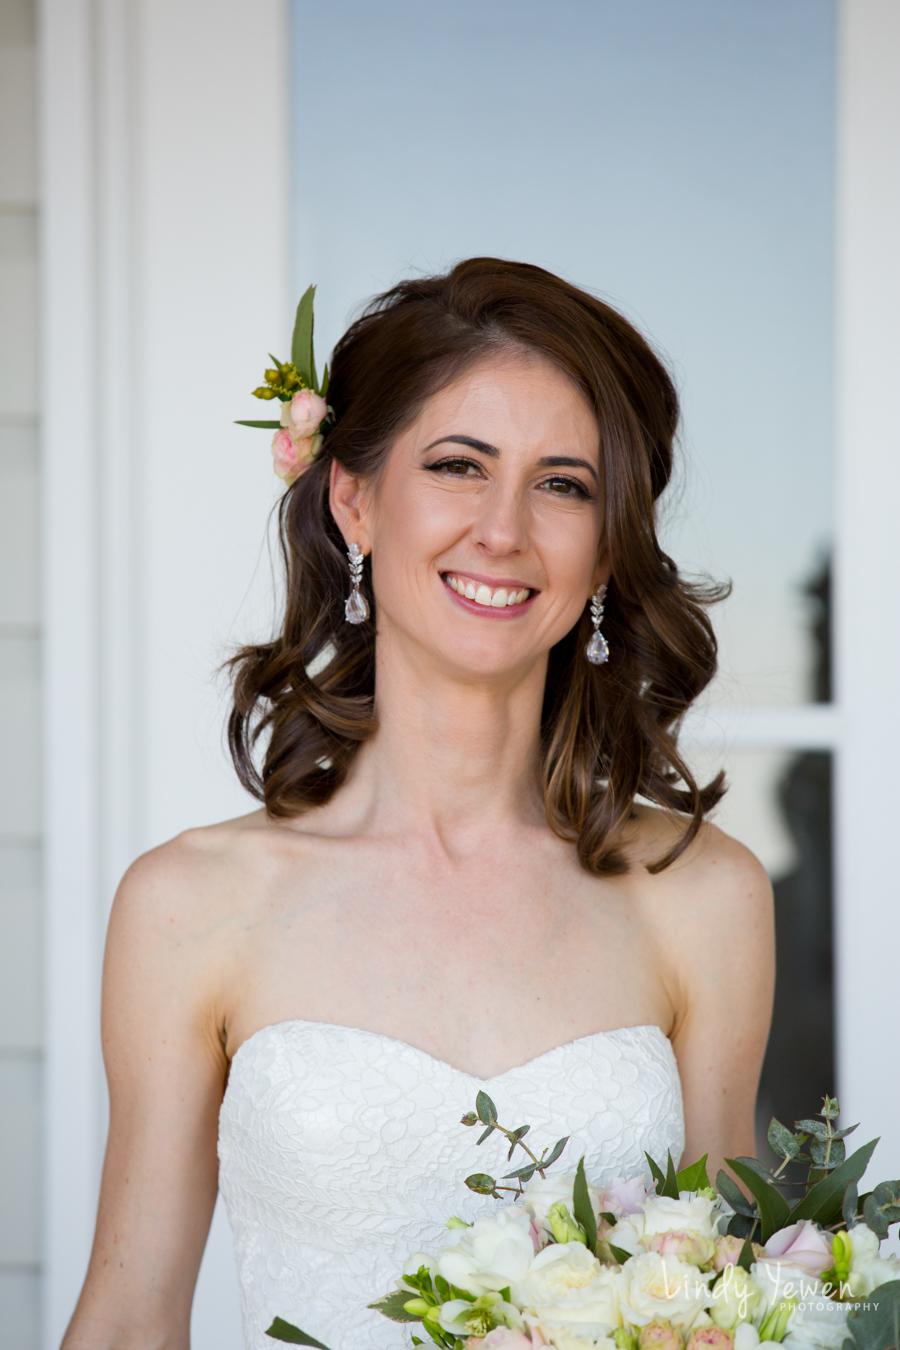 Montville-wedding-photographer-Lauren-Kirby 328.jpg